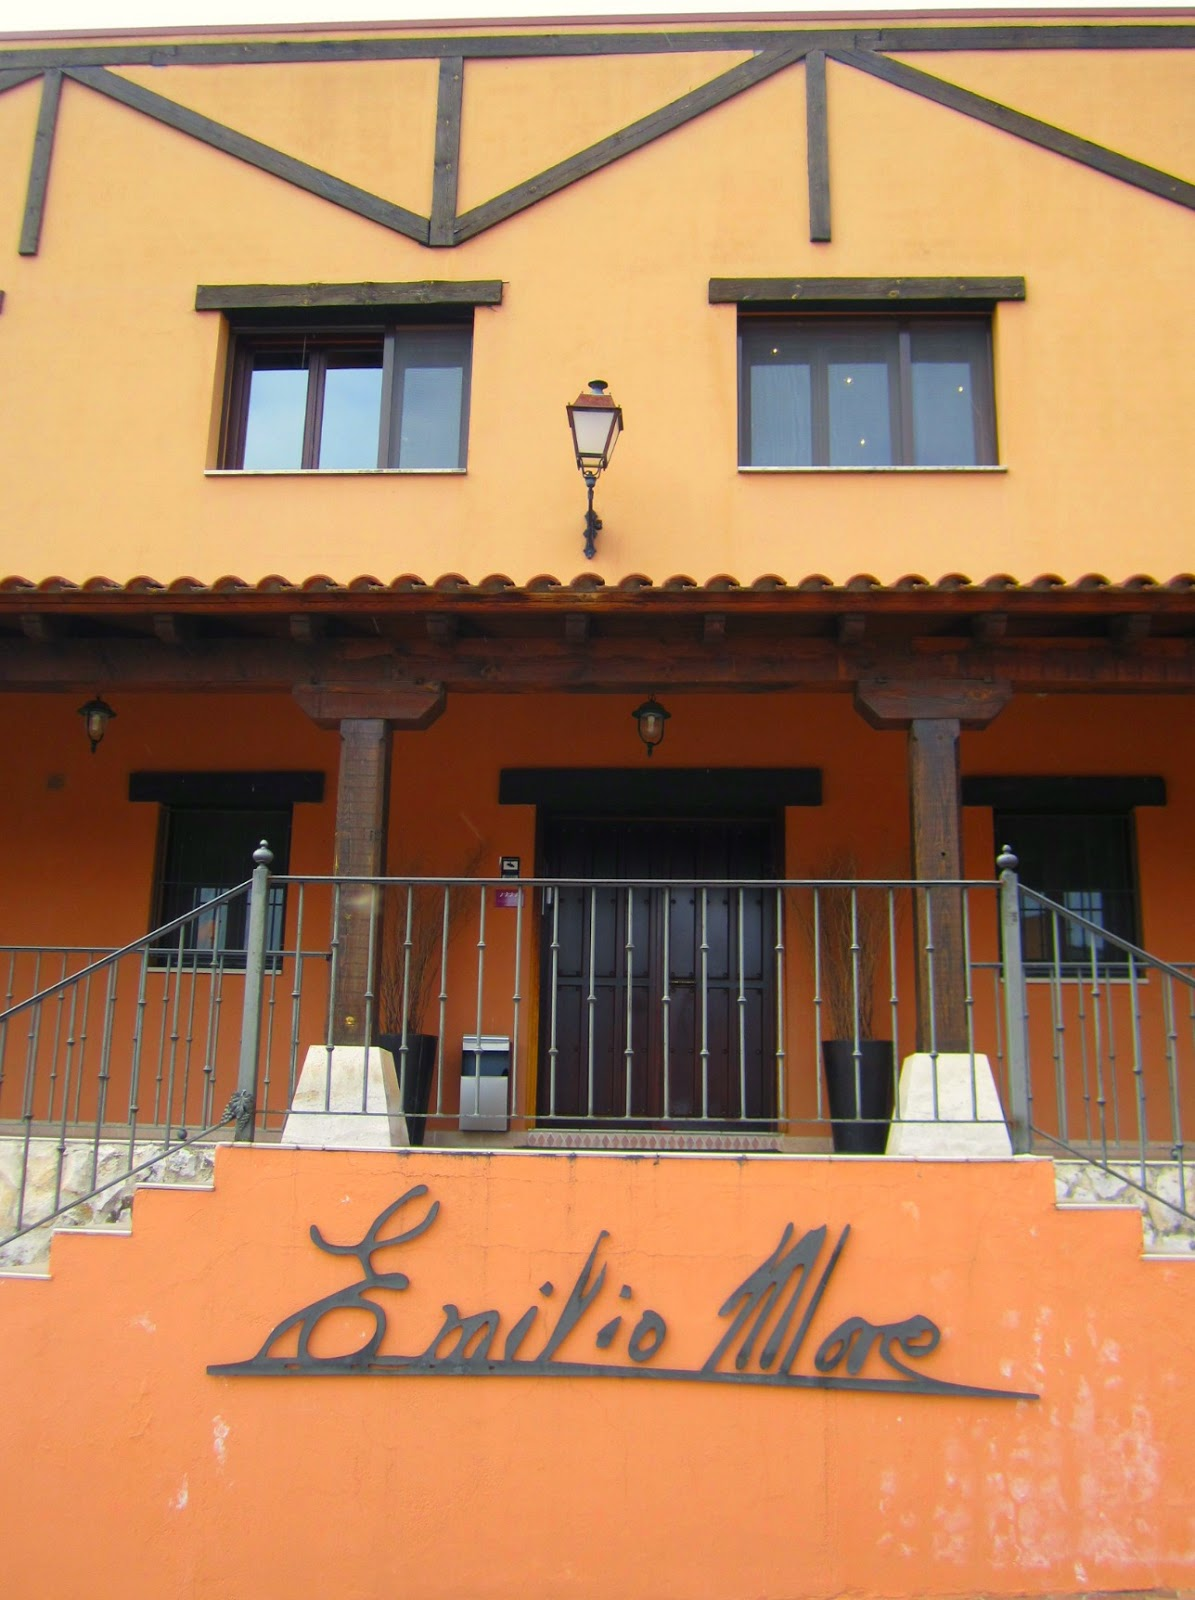 Experiencia Enoturística Taller de Barricas Emilio Moro Bodegas Esencia Trendy Lifestyle Cata Vinos Experiencia Trendy Gastro